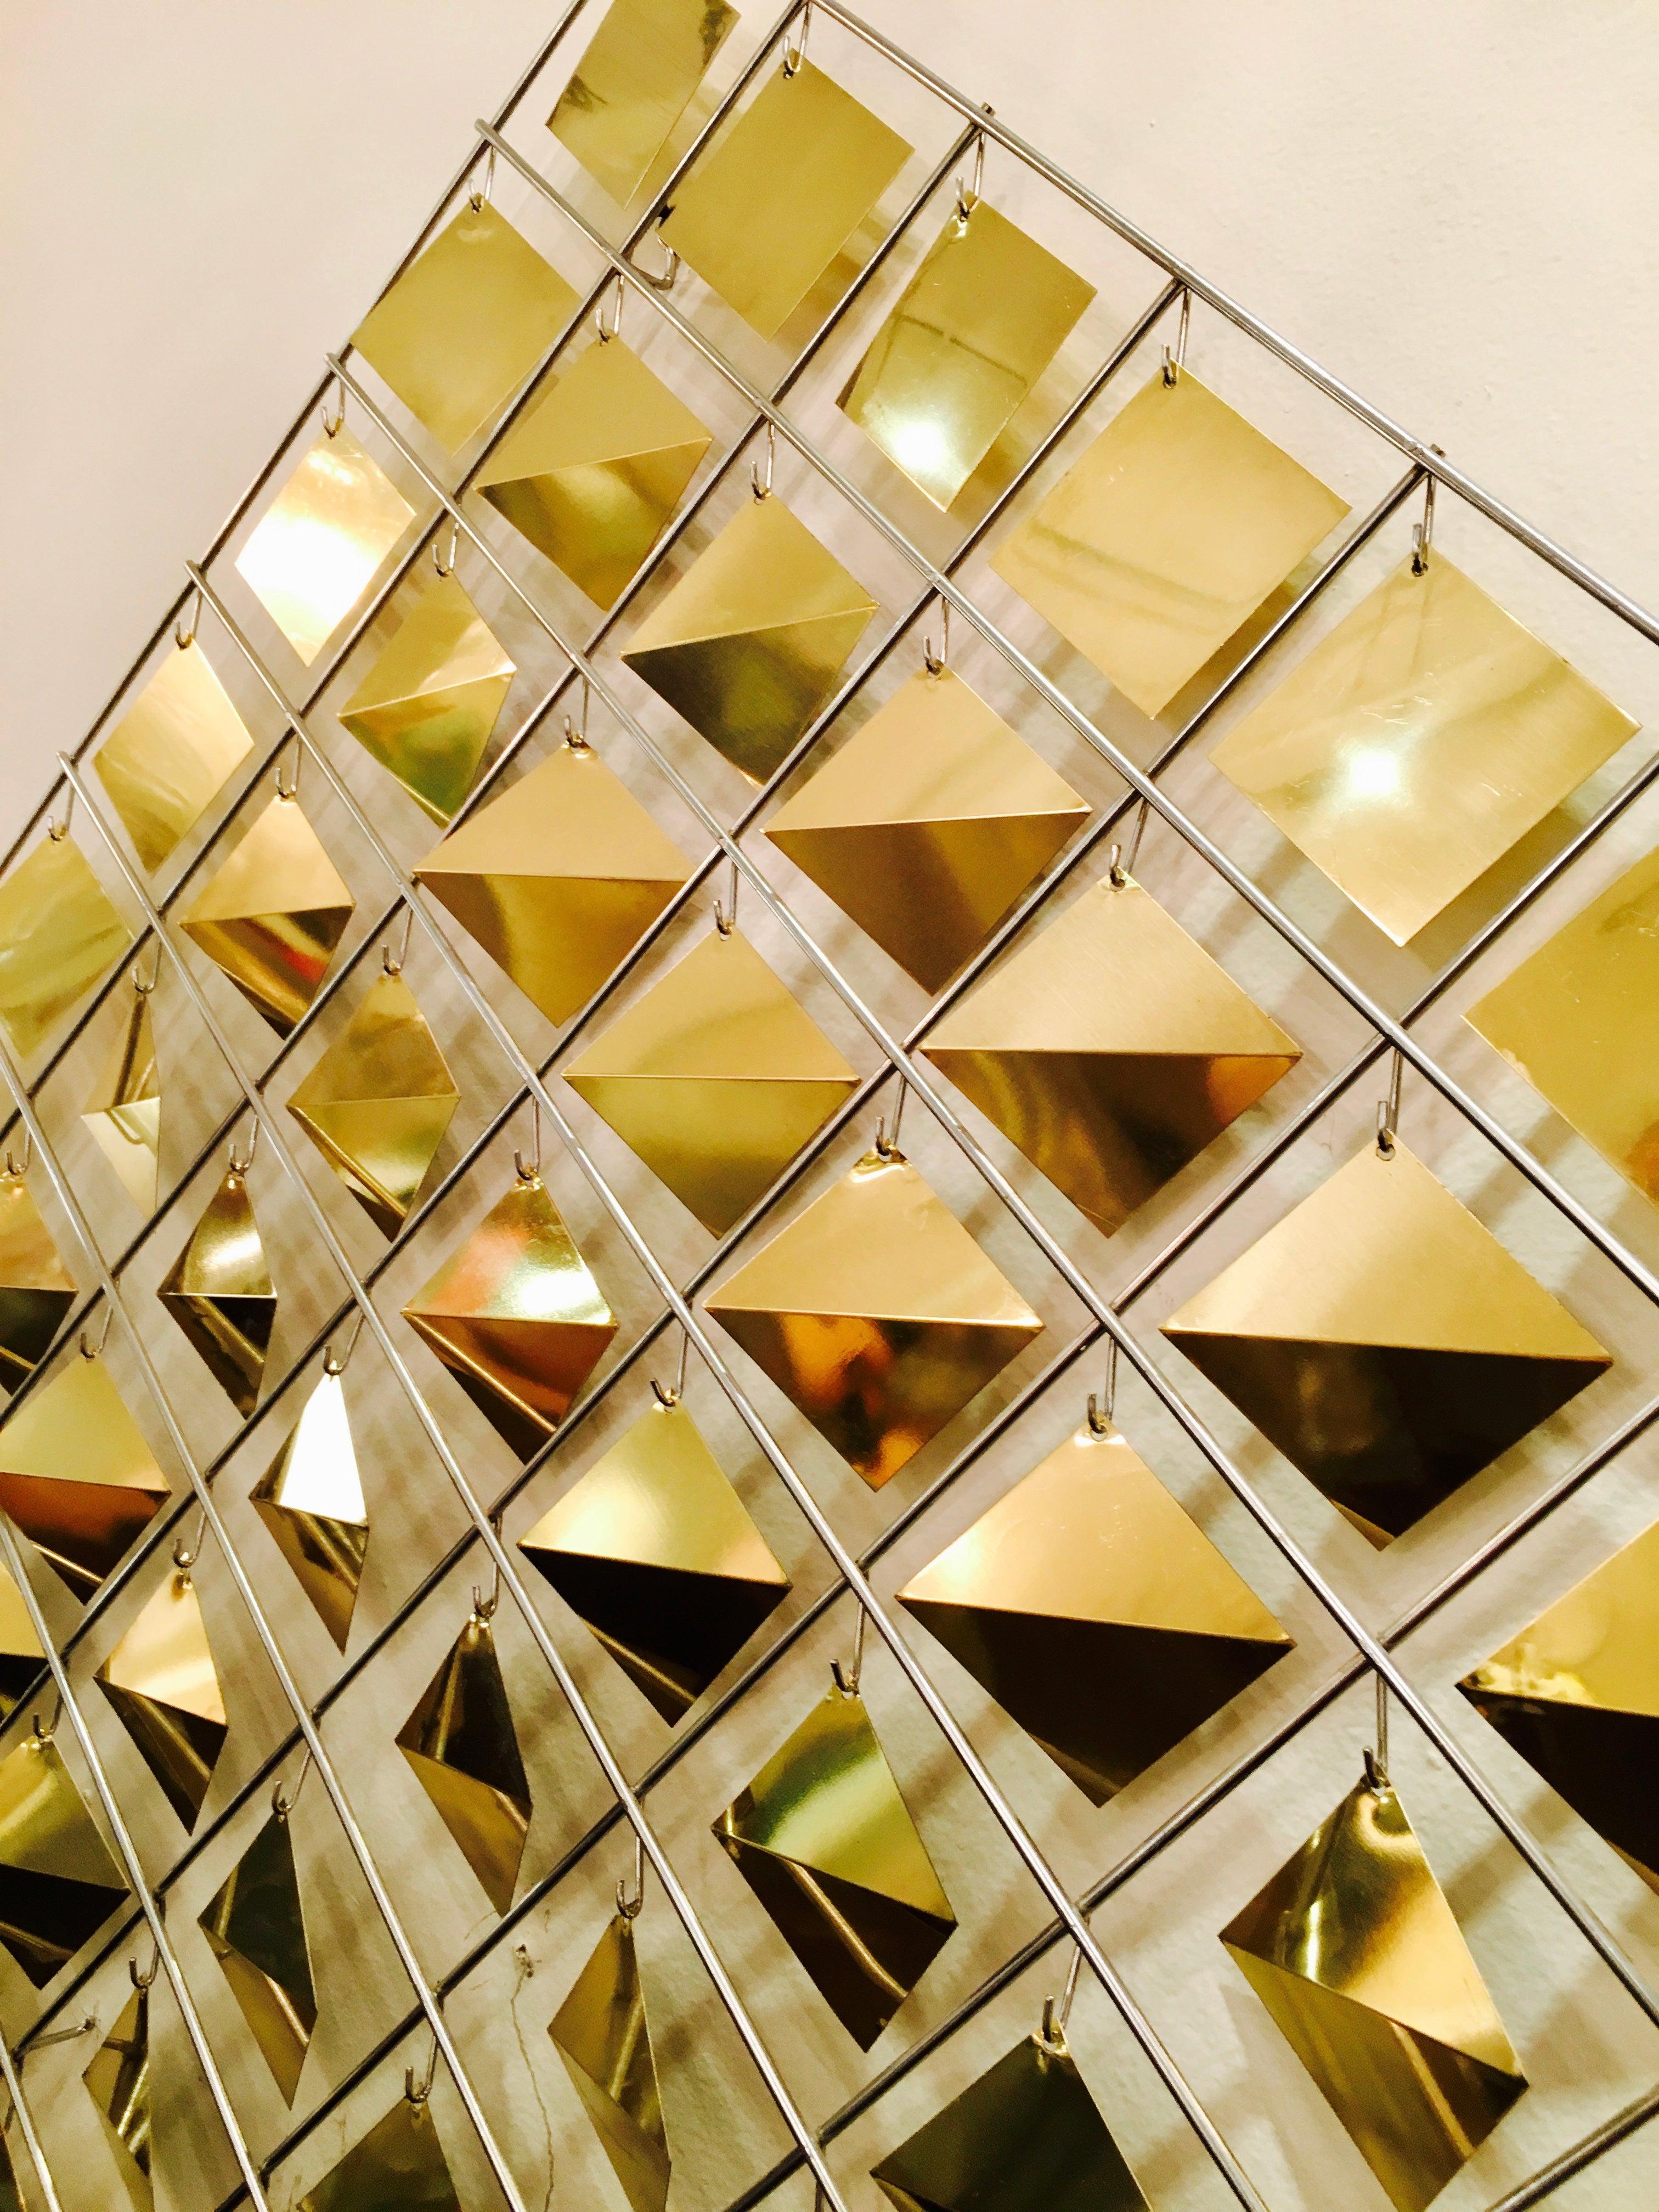 Modern Kinetic Wall Art Adornment - All About Wallart - adelgazare.info